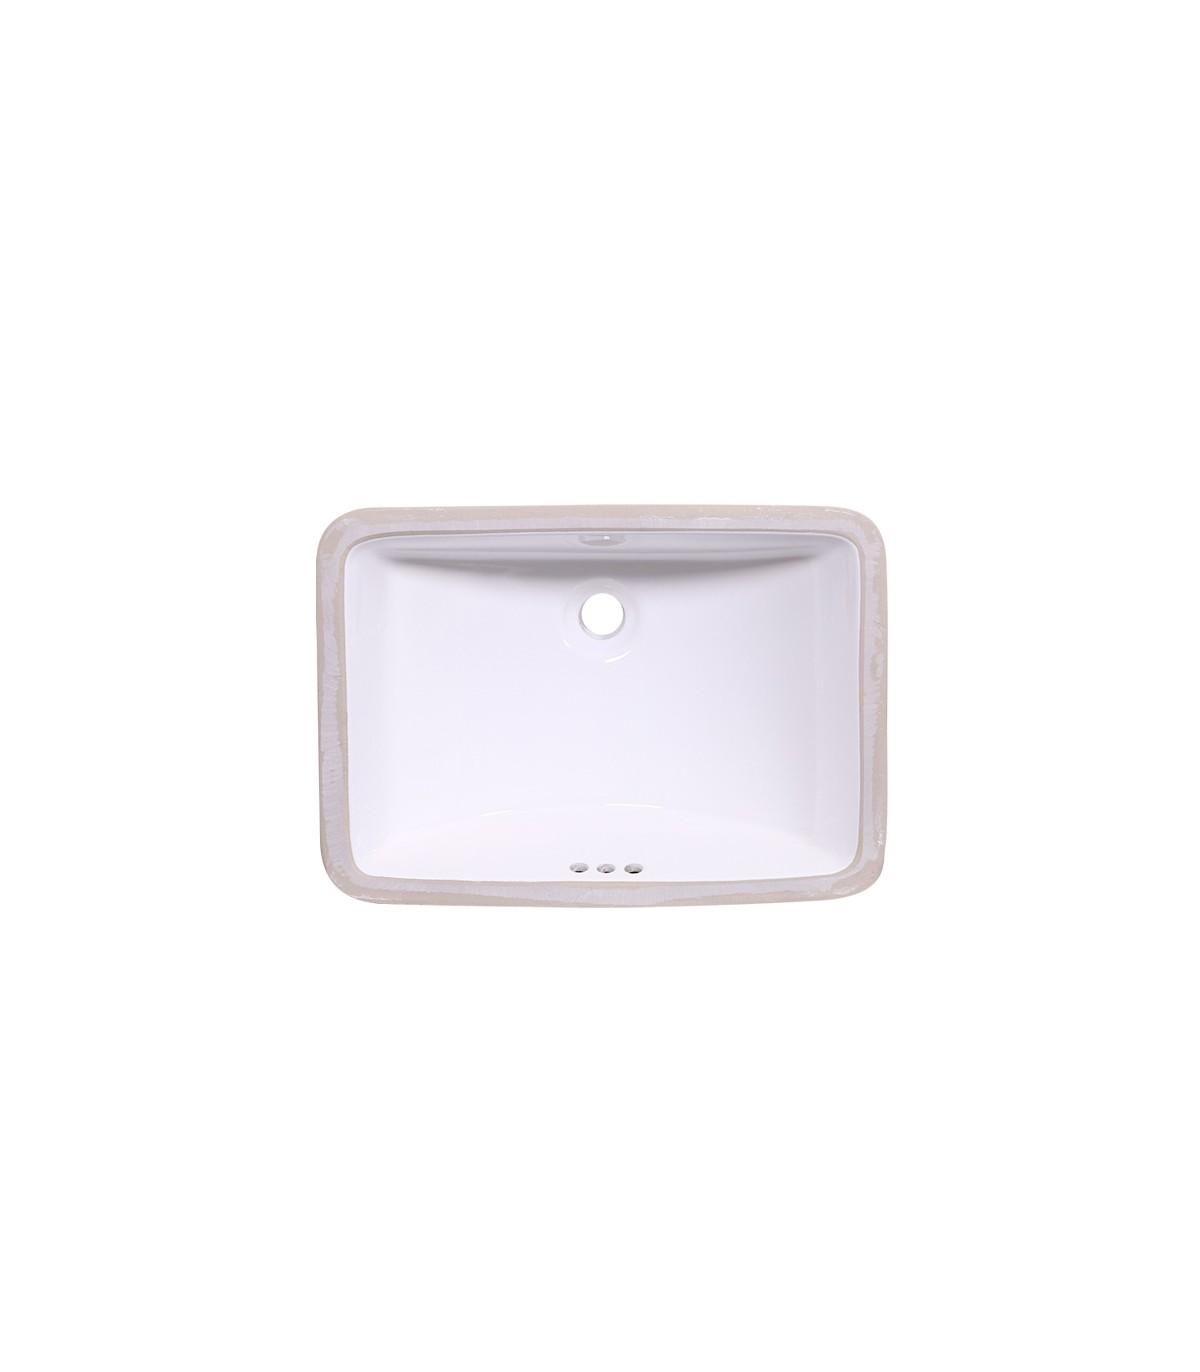 LS-C6 Undermount Rectangular Ceramic Sink White